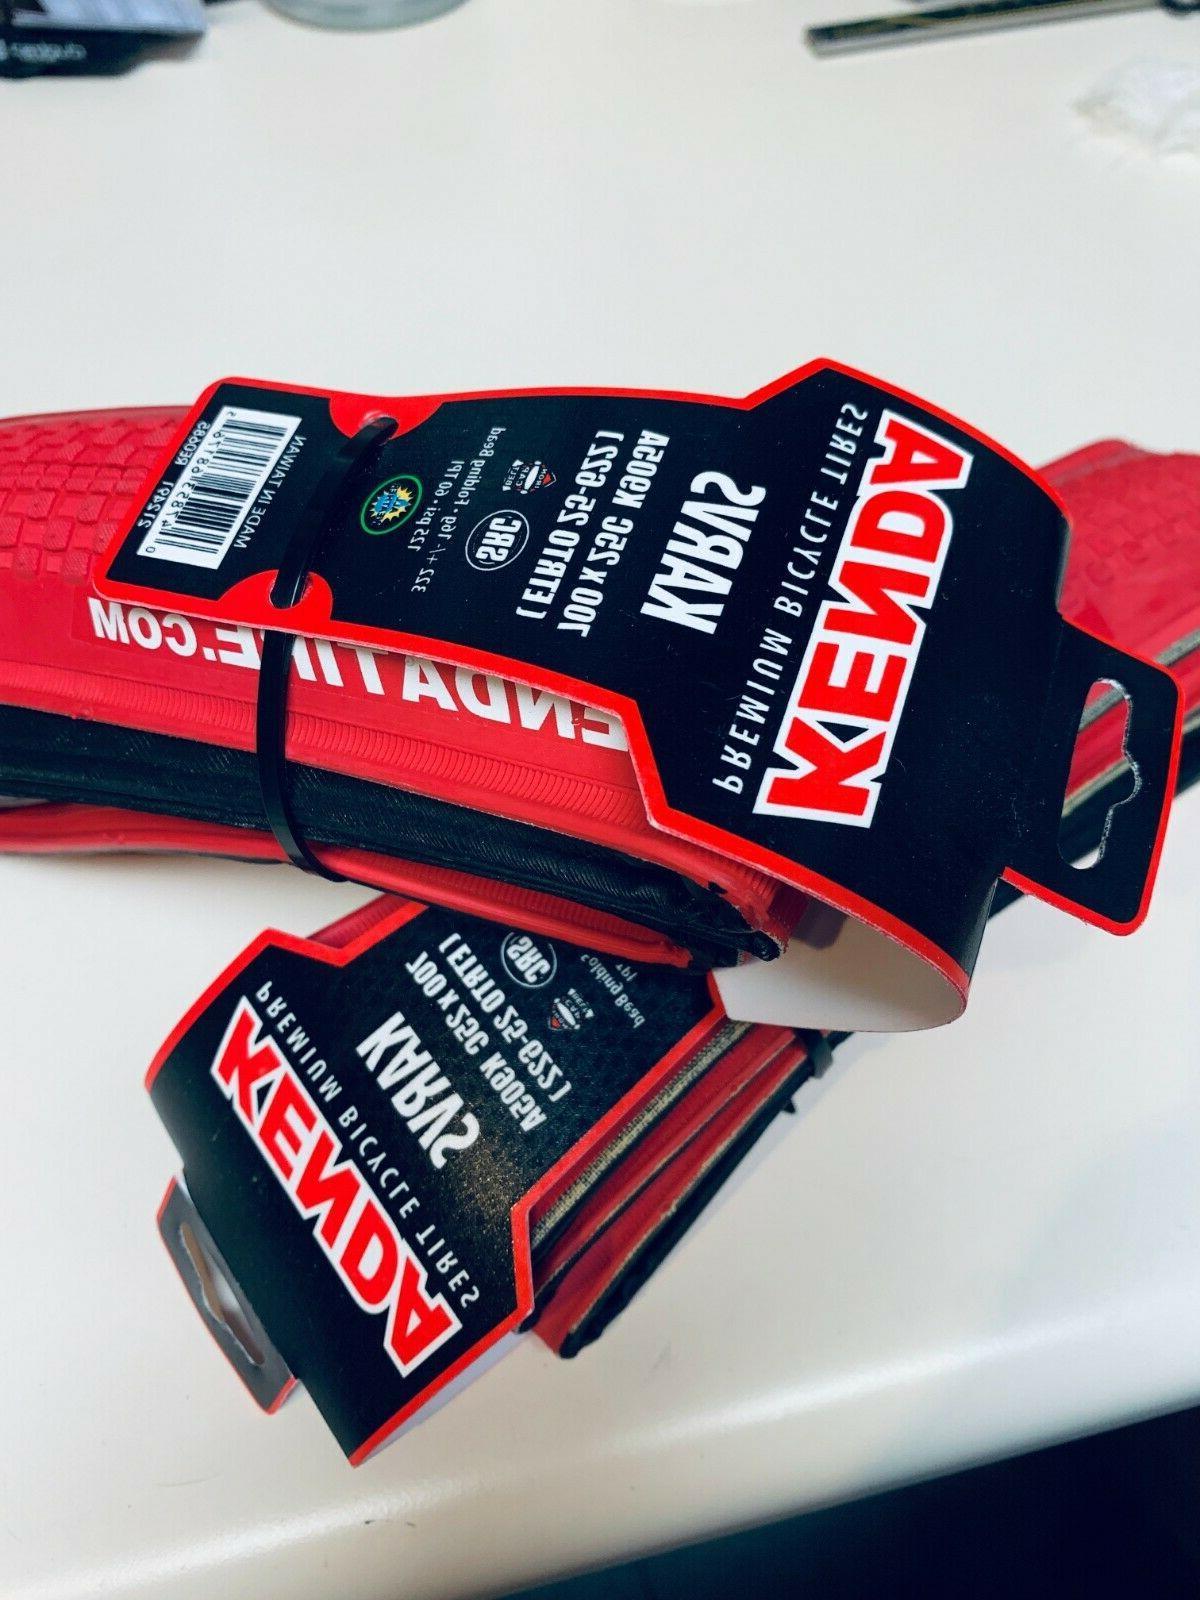 Kenda Karvs 700x23c Folding Road/Gravel Bike Tire, Red